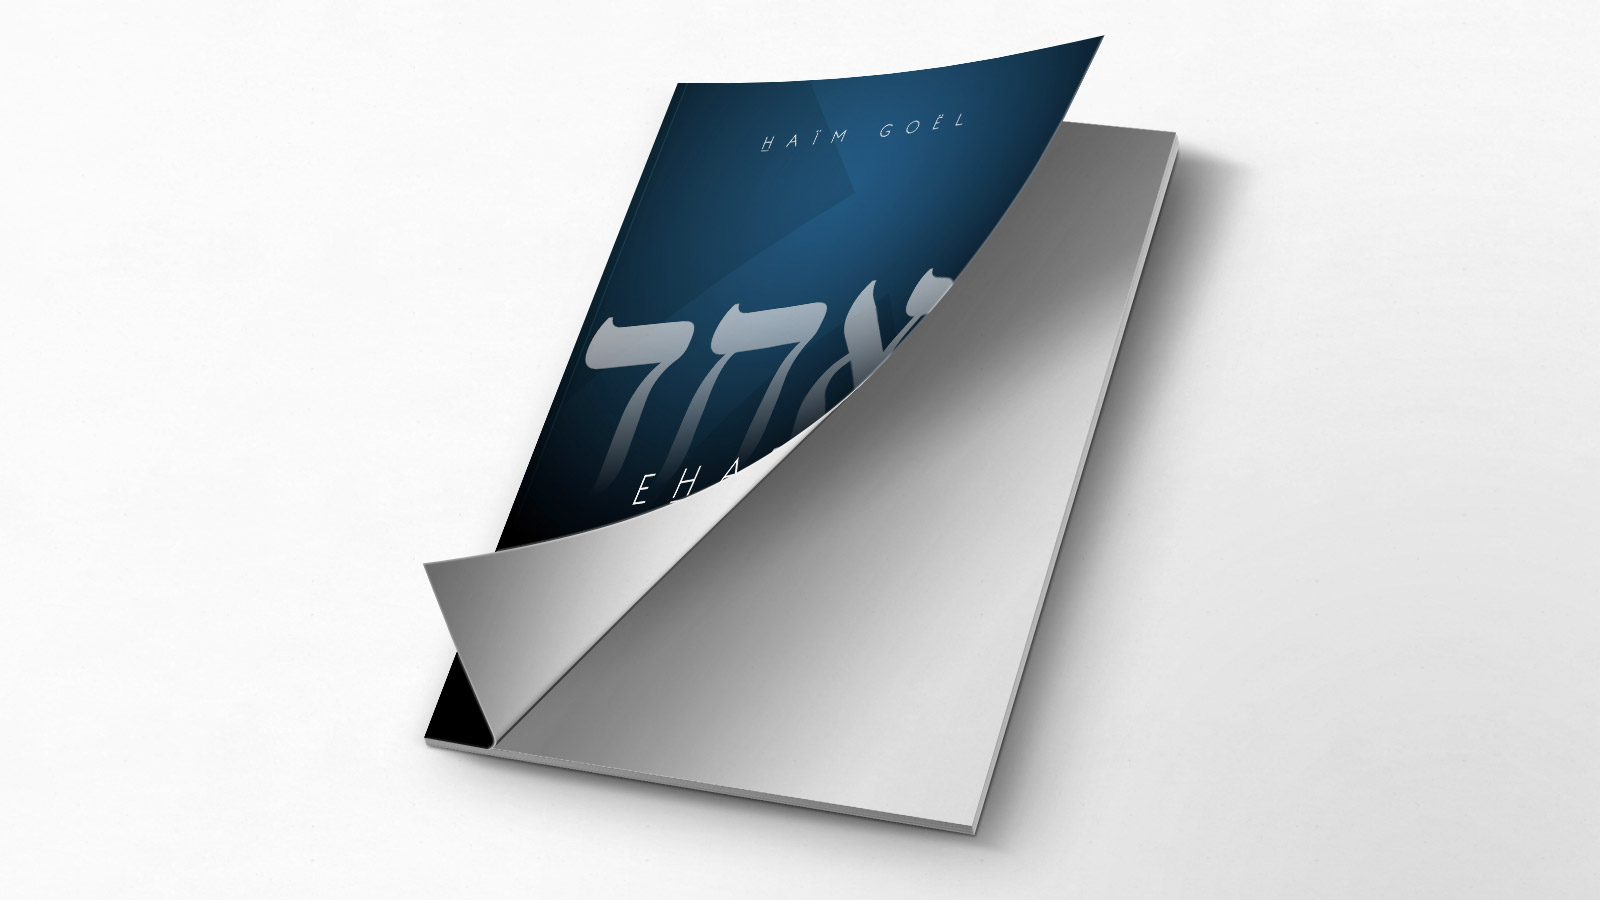 sublime-digital_ehad-unite-book-cover-06